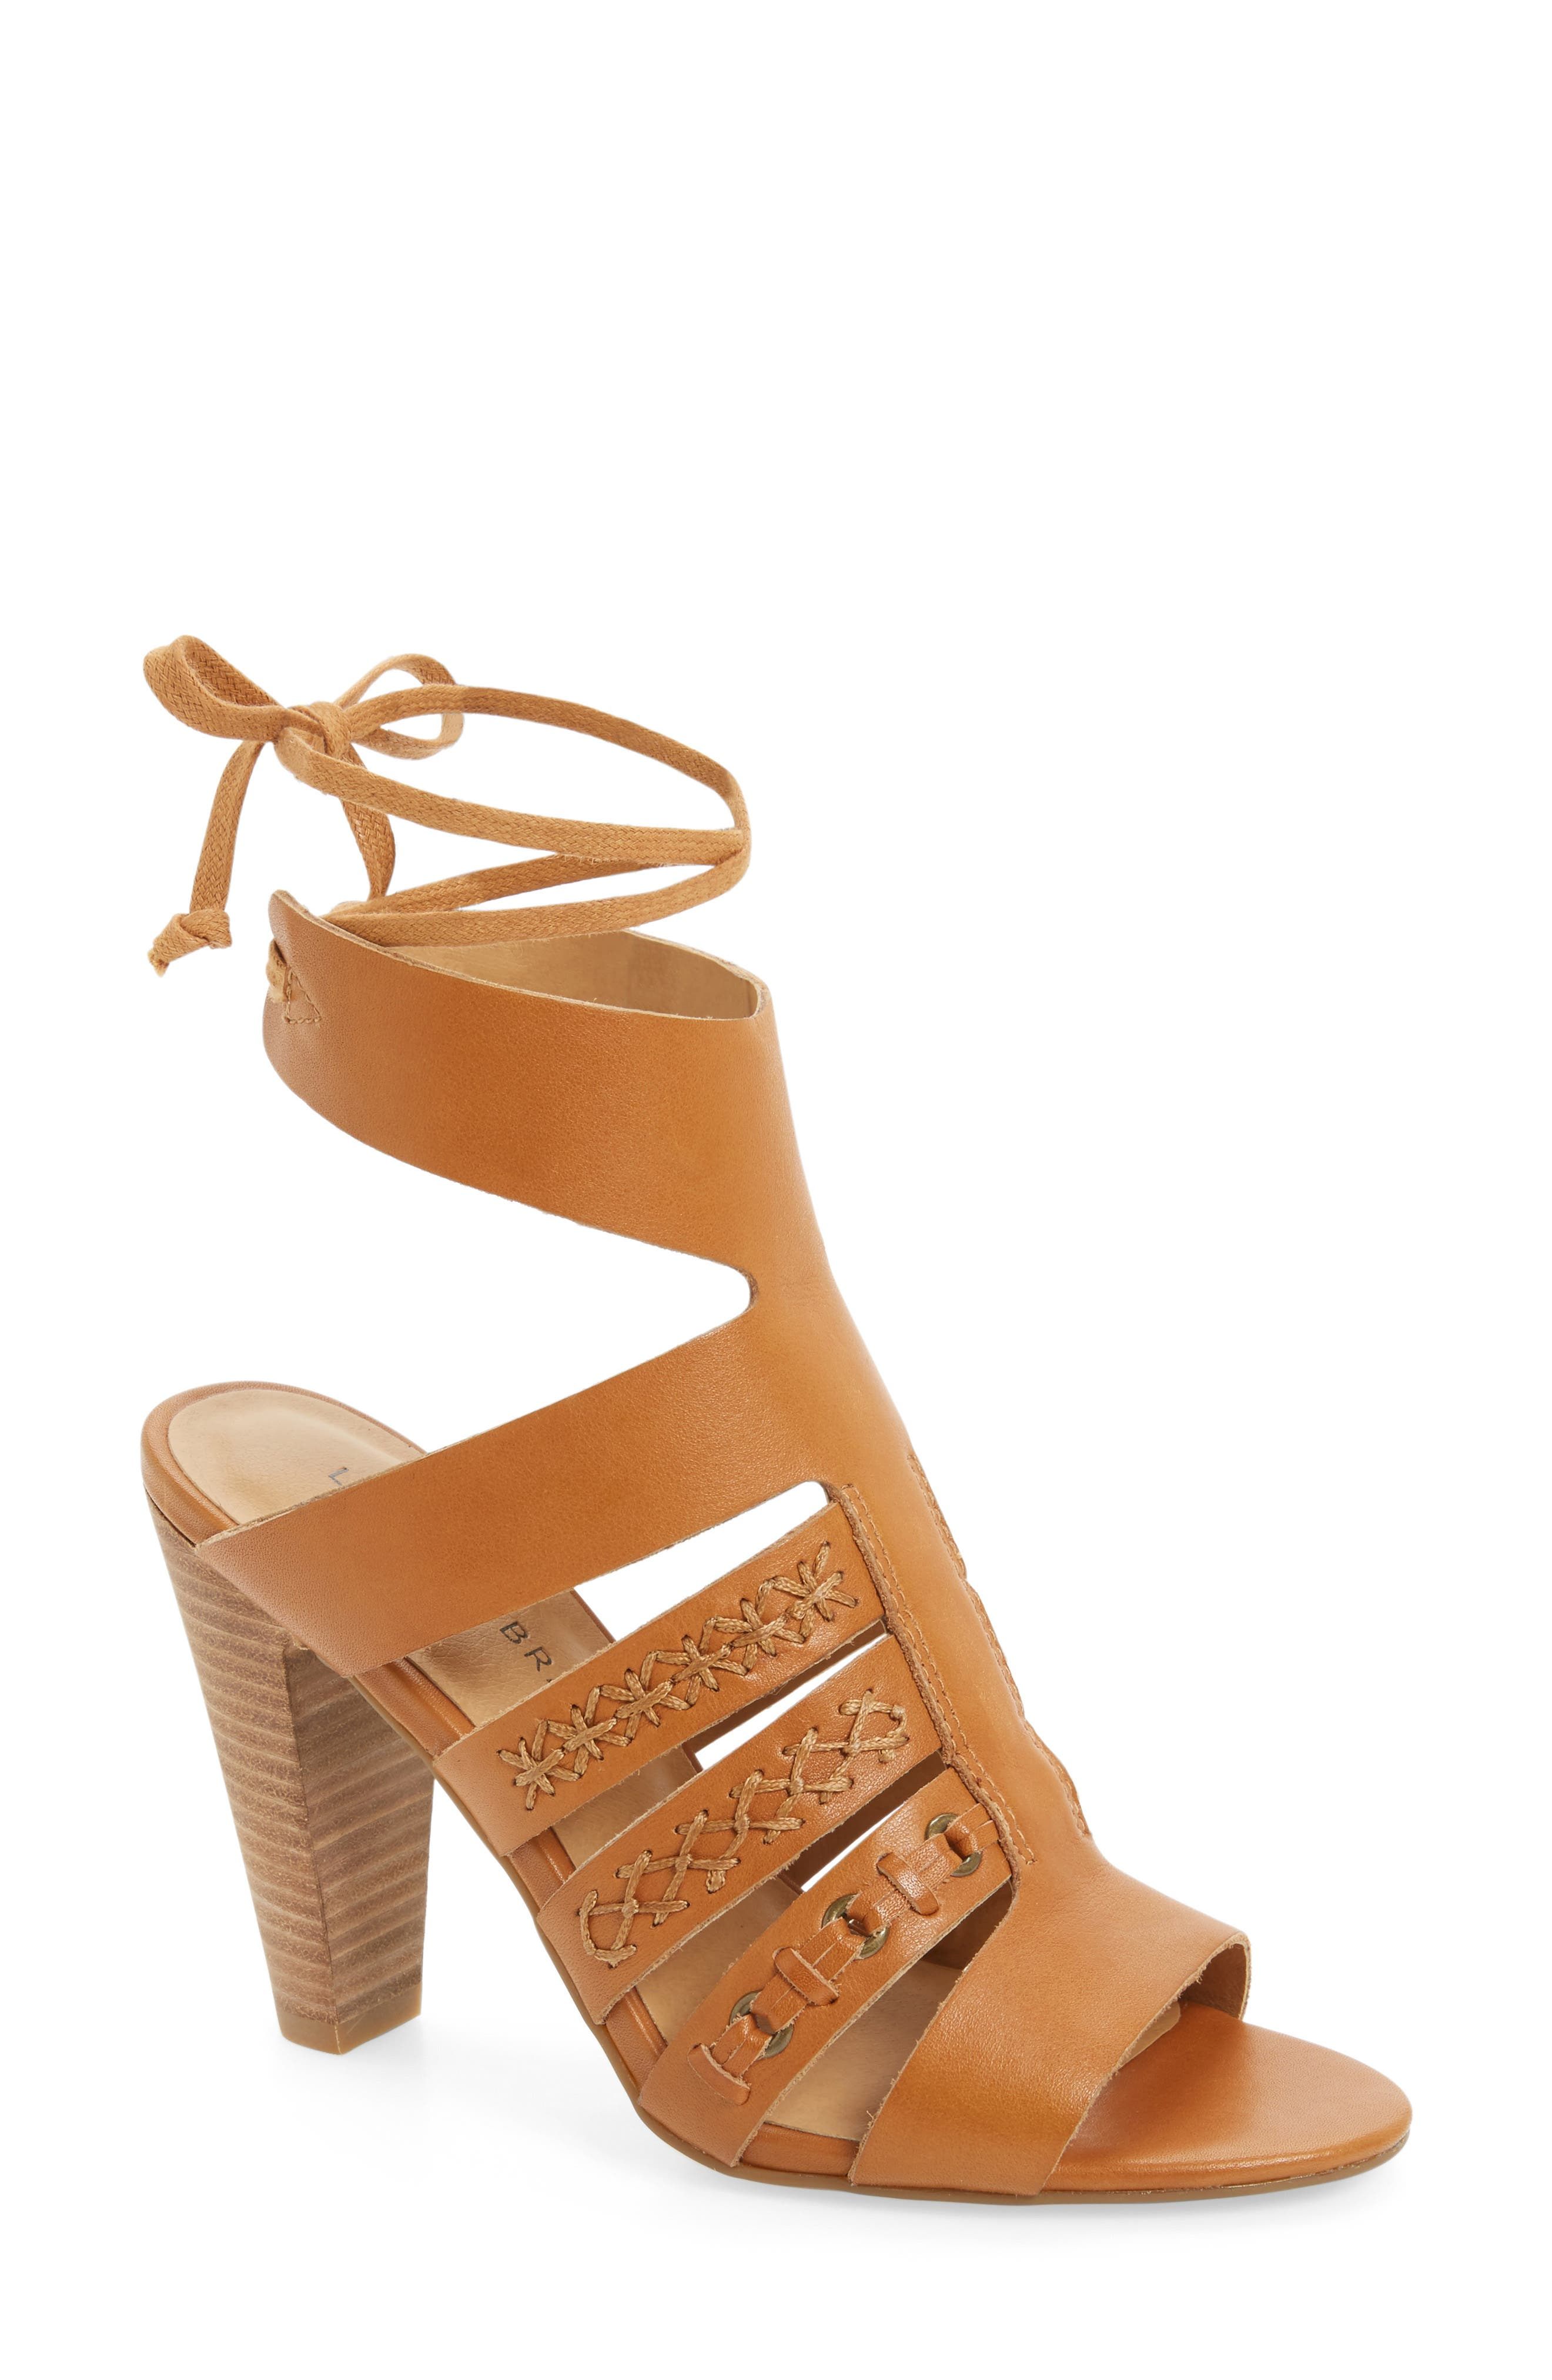 Main Image - Lucky Brand Radfas Lace-Up Sandal (Women)